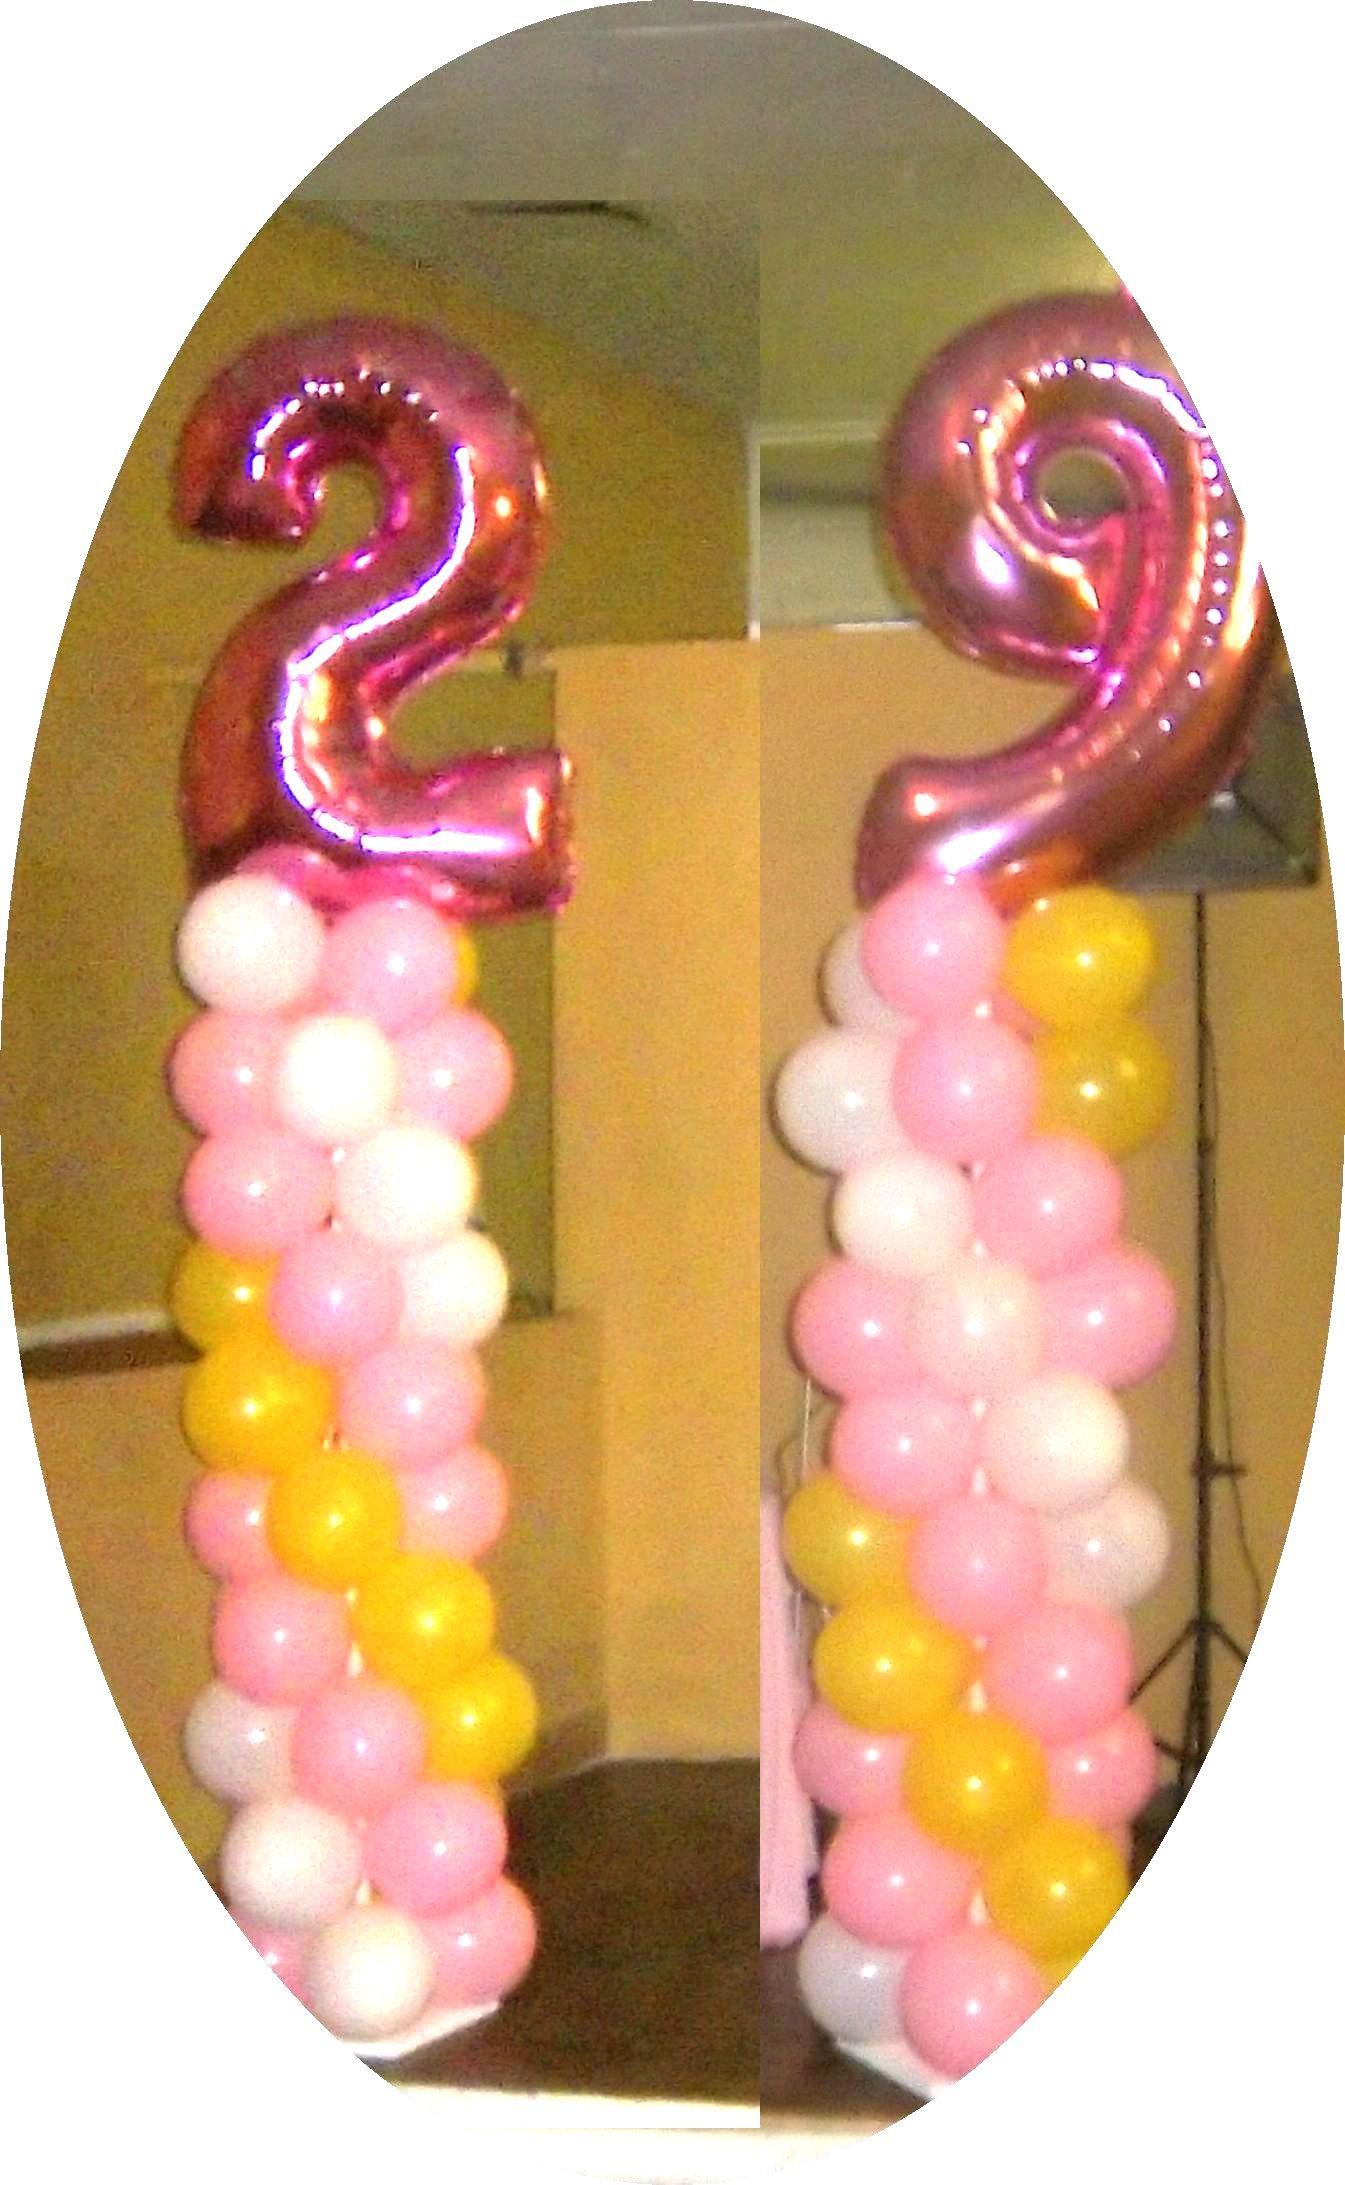 29th Birthday Party Ideas For Her - 29th birthday party themesballoonhobbiesbirthday